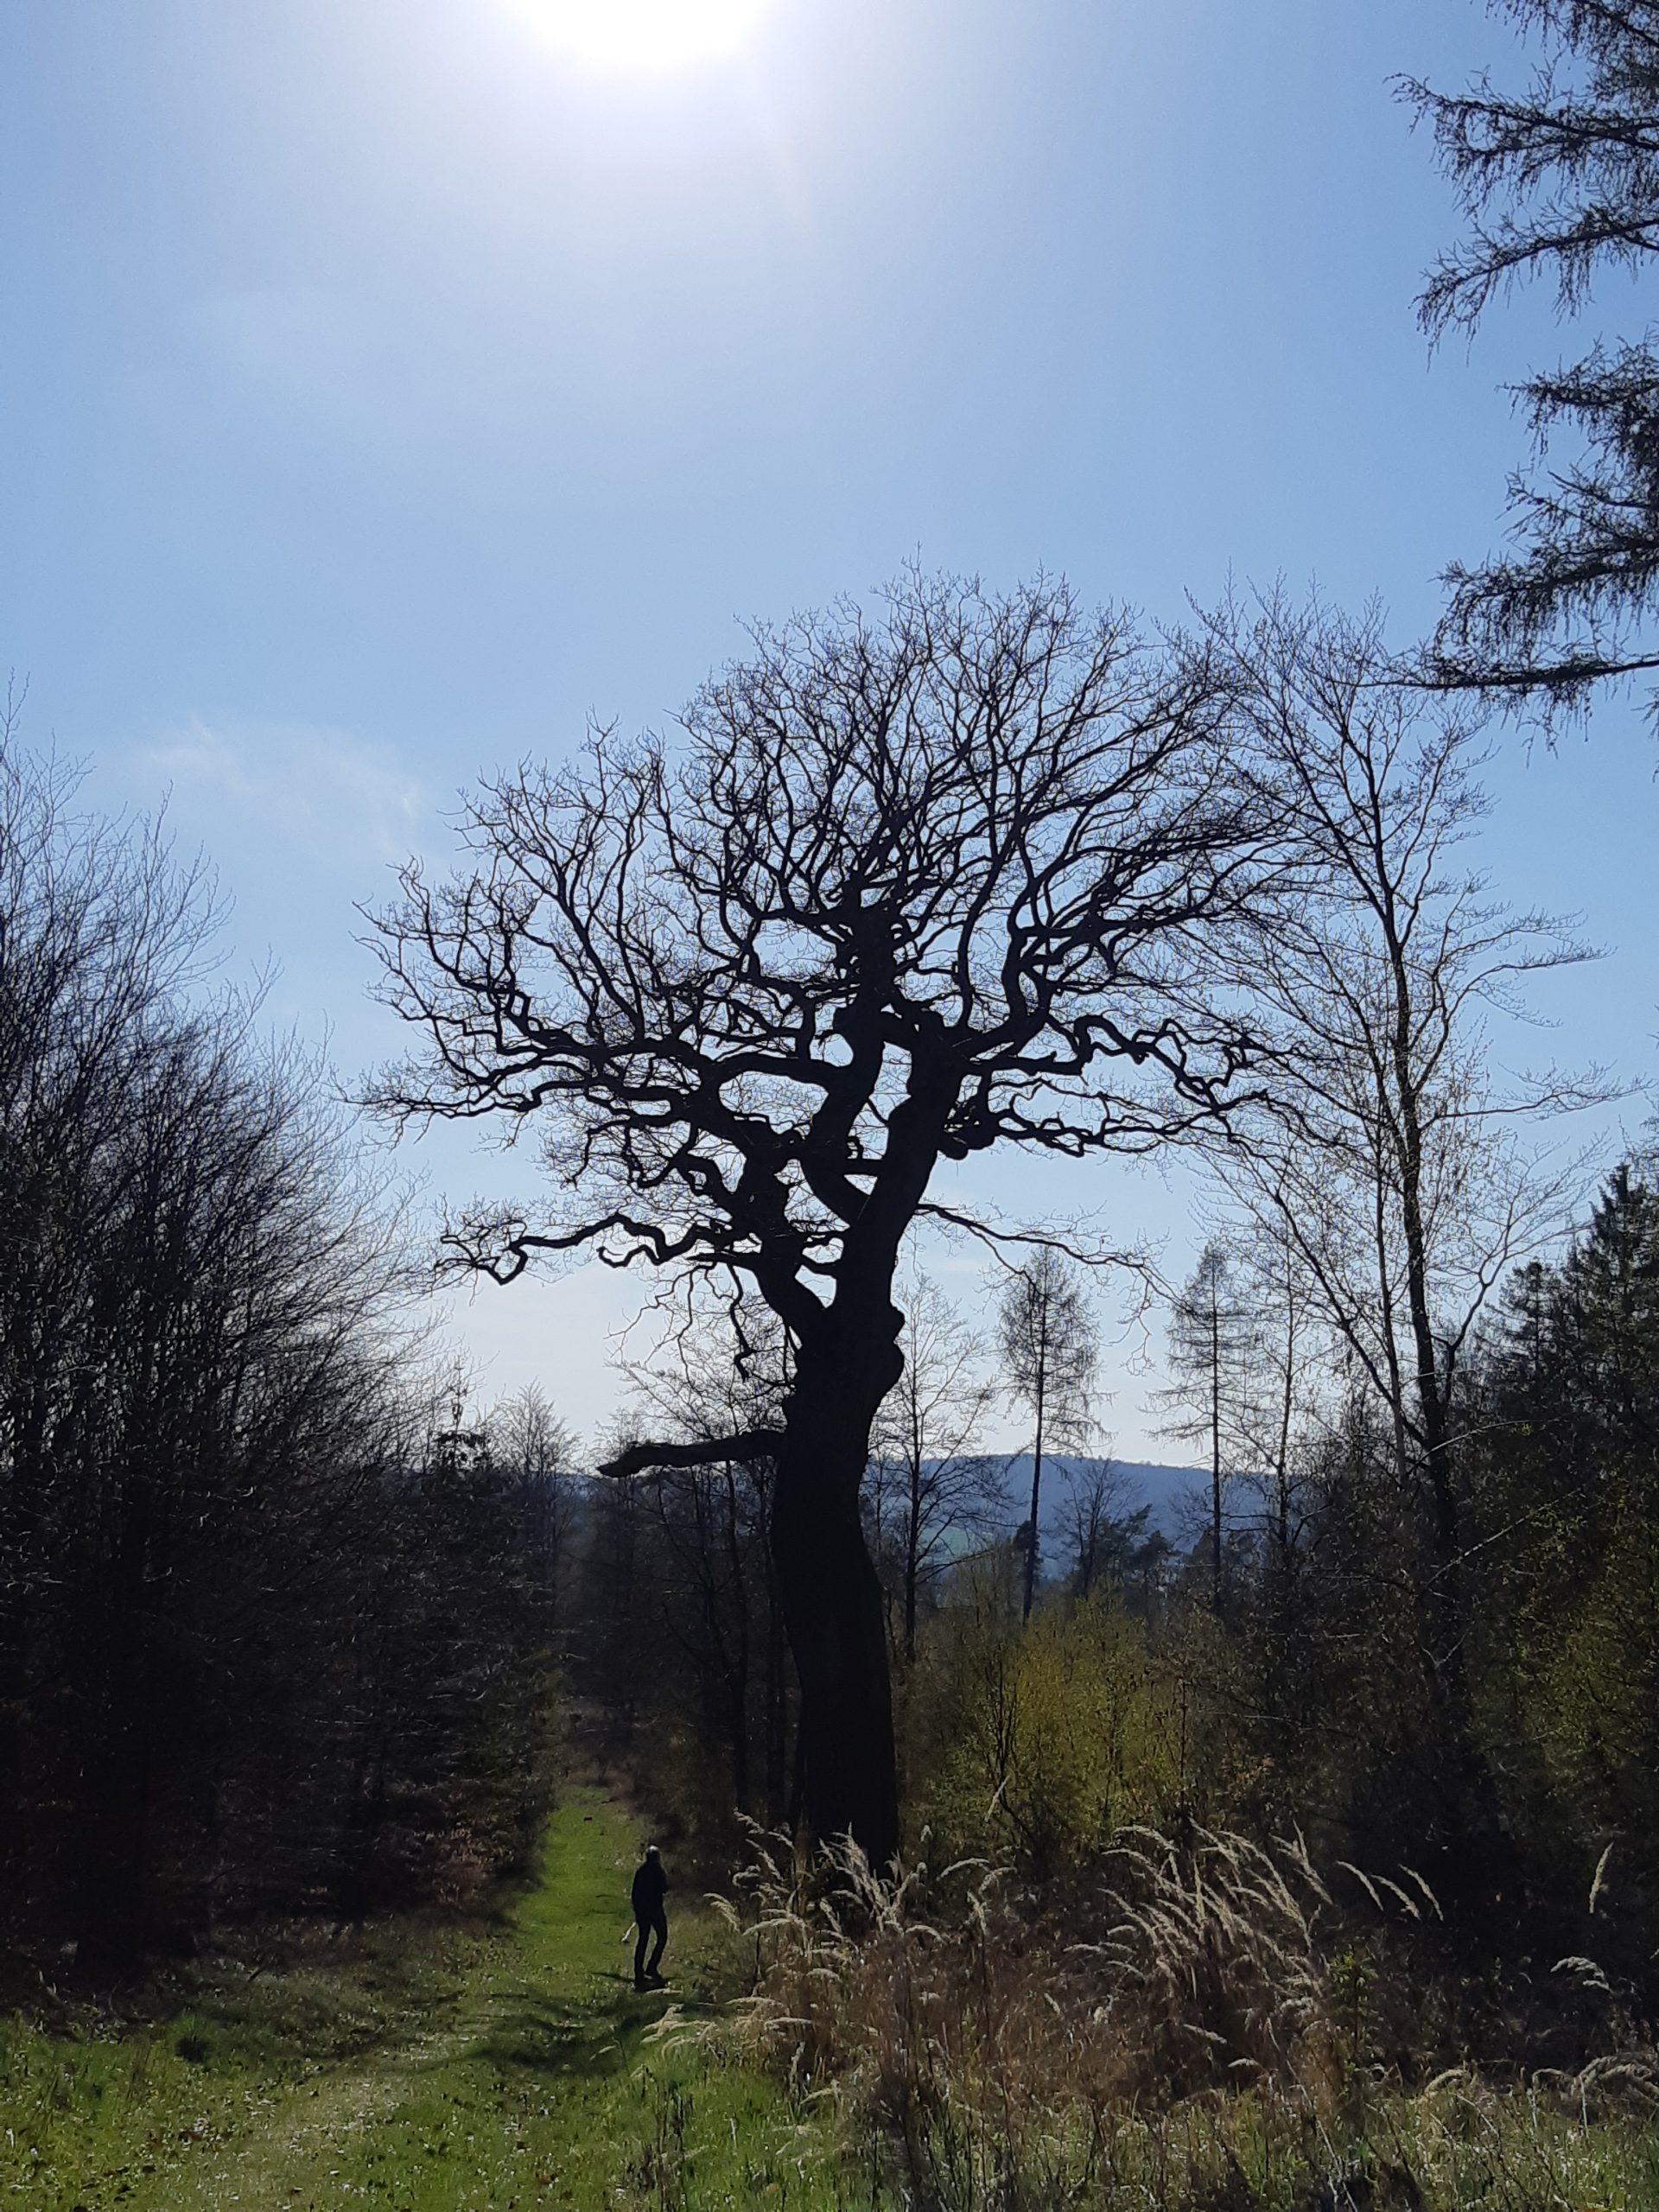 Hutewald Premiumwanderweg bei Knüllwald-Rengshausen